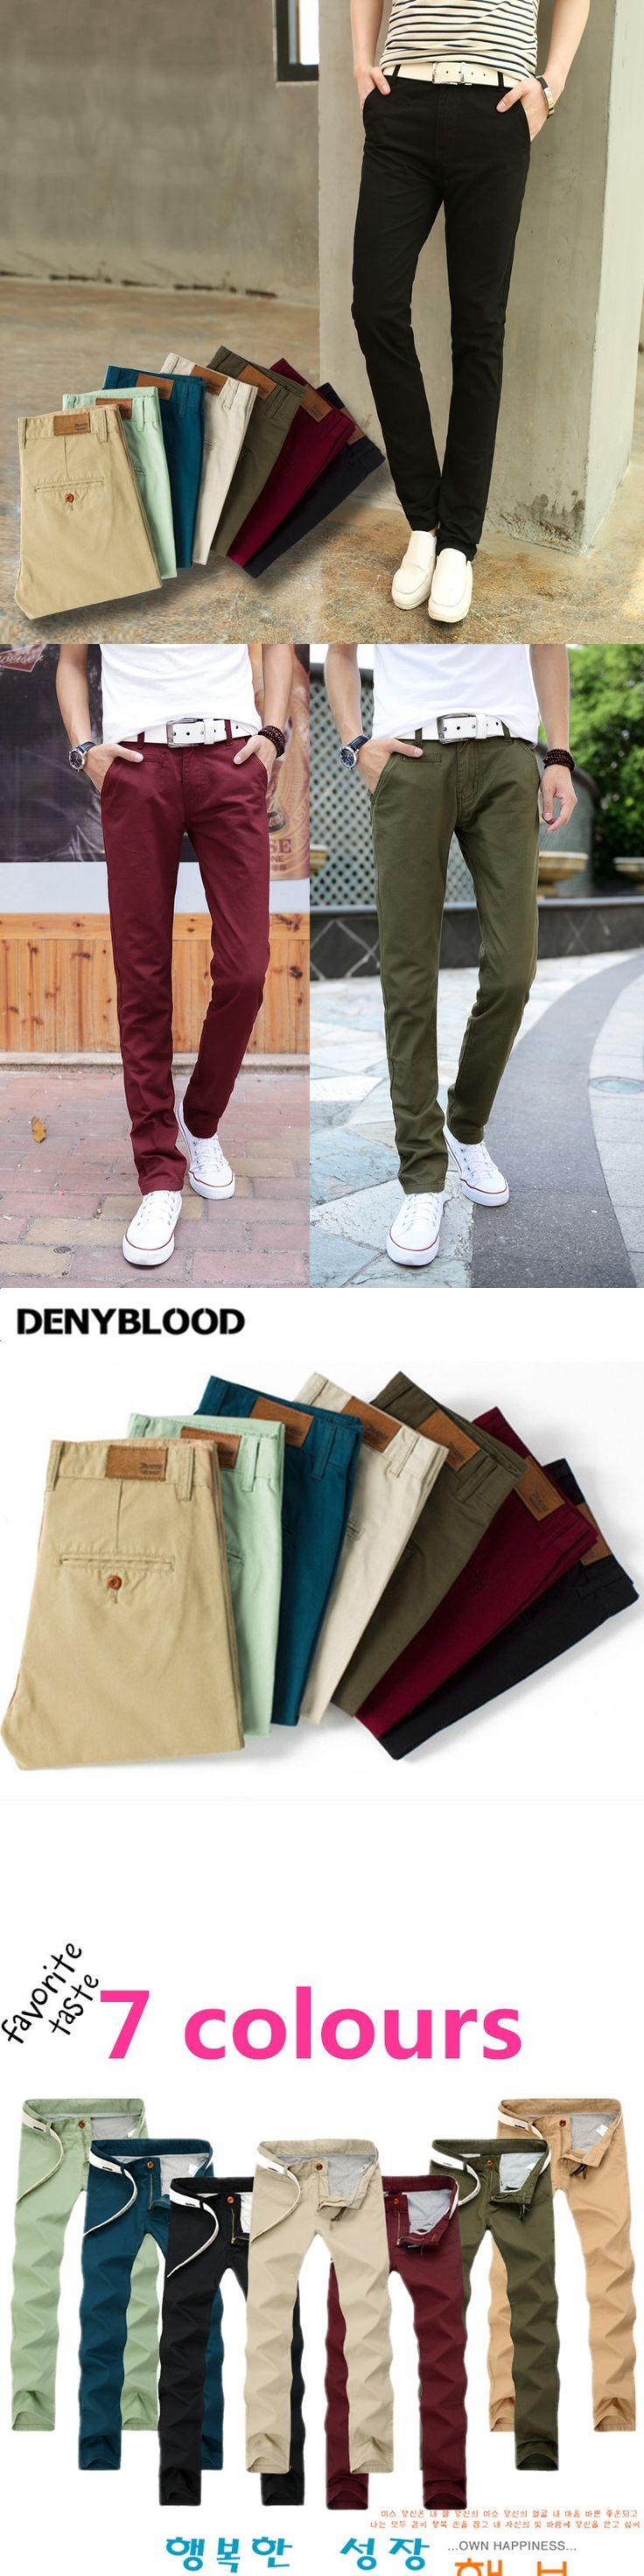 Plus Size Mens Slim Straight Chino Pants Darked Wash Jeans  Mens Slim Chinos Casual Pants Black,Army Green,Khaki 7Colours  501